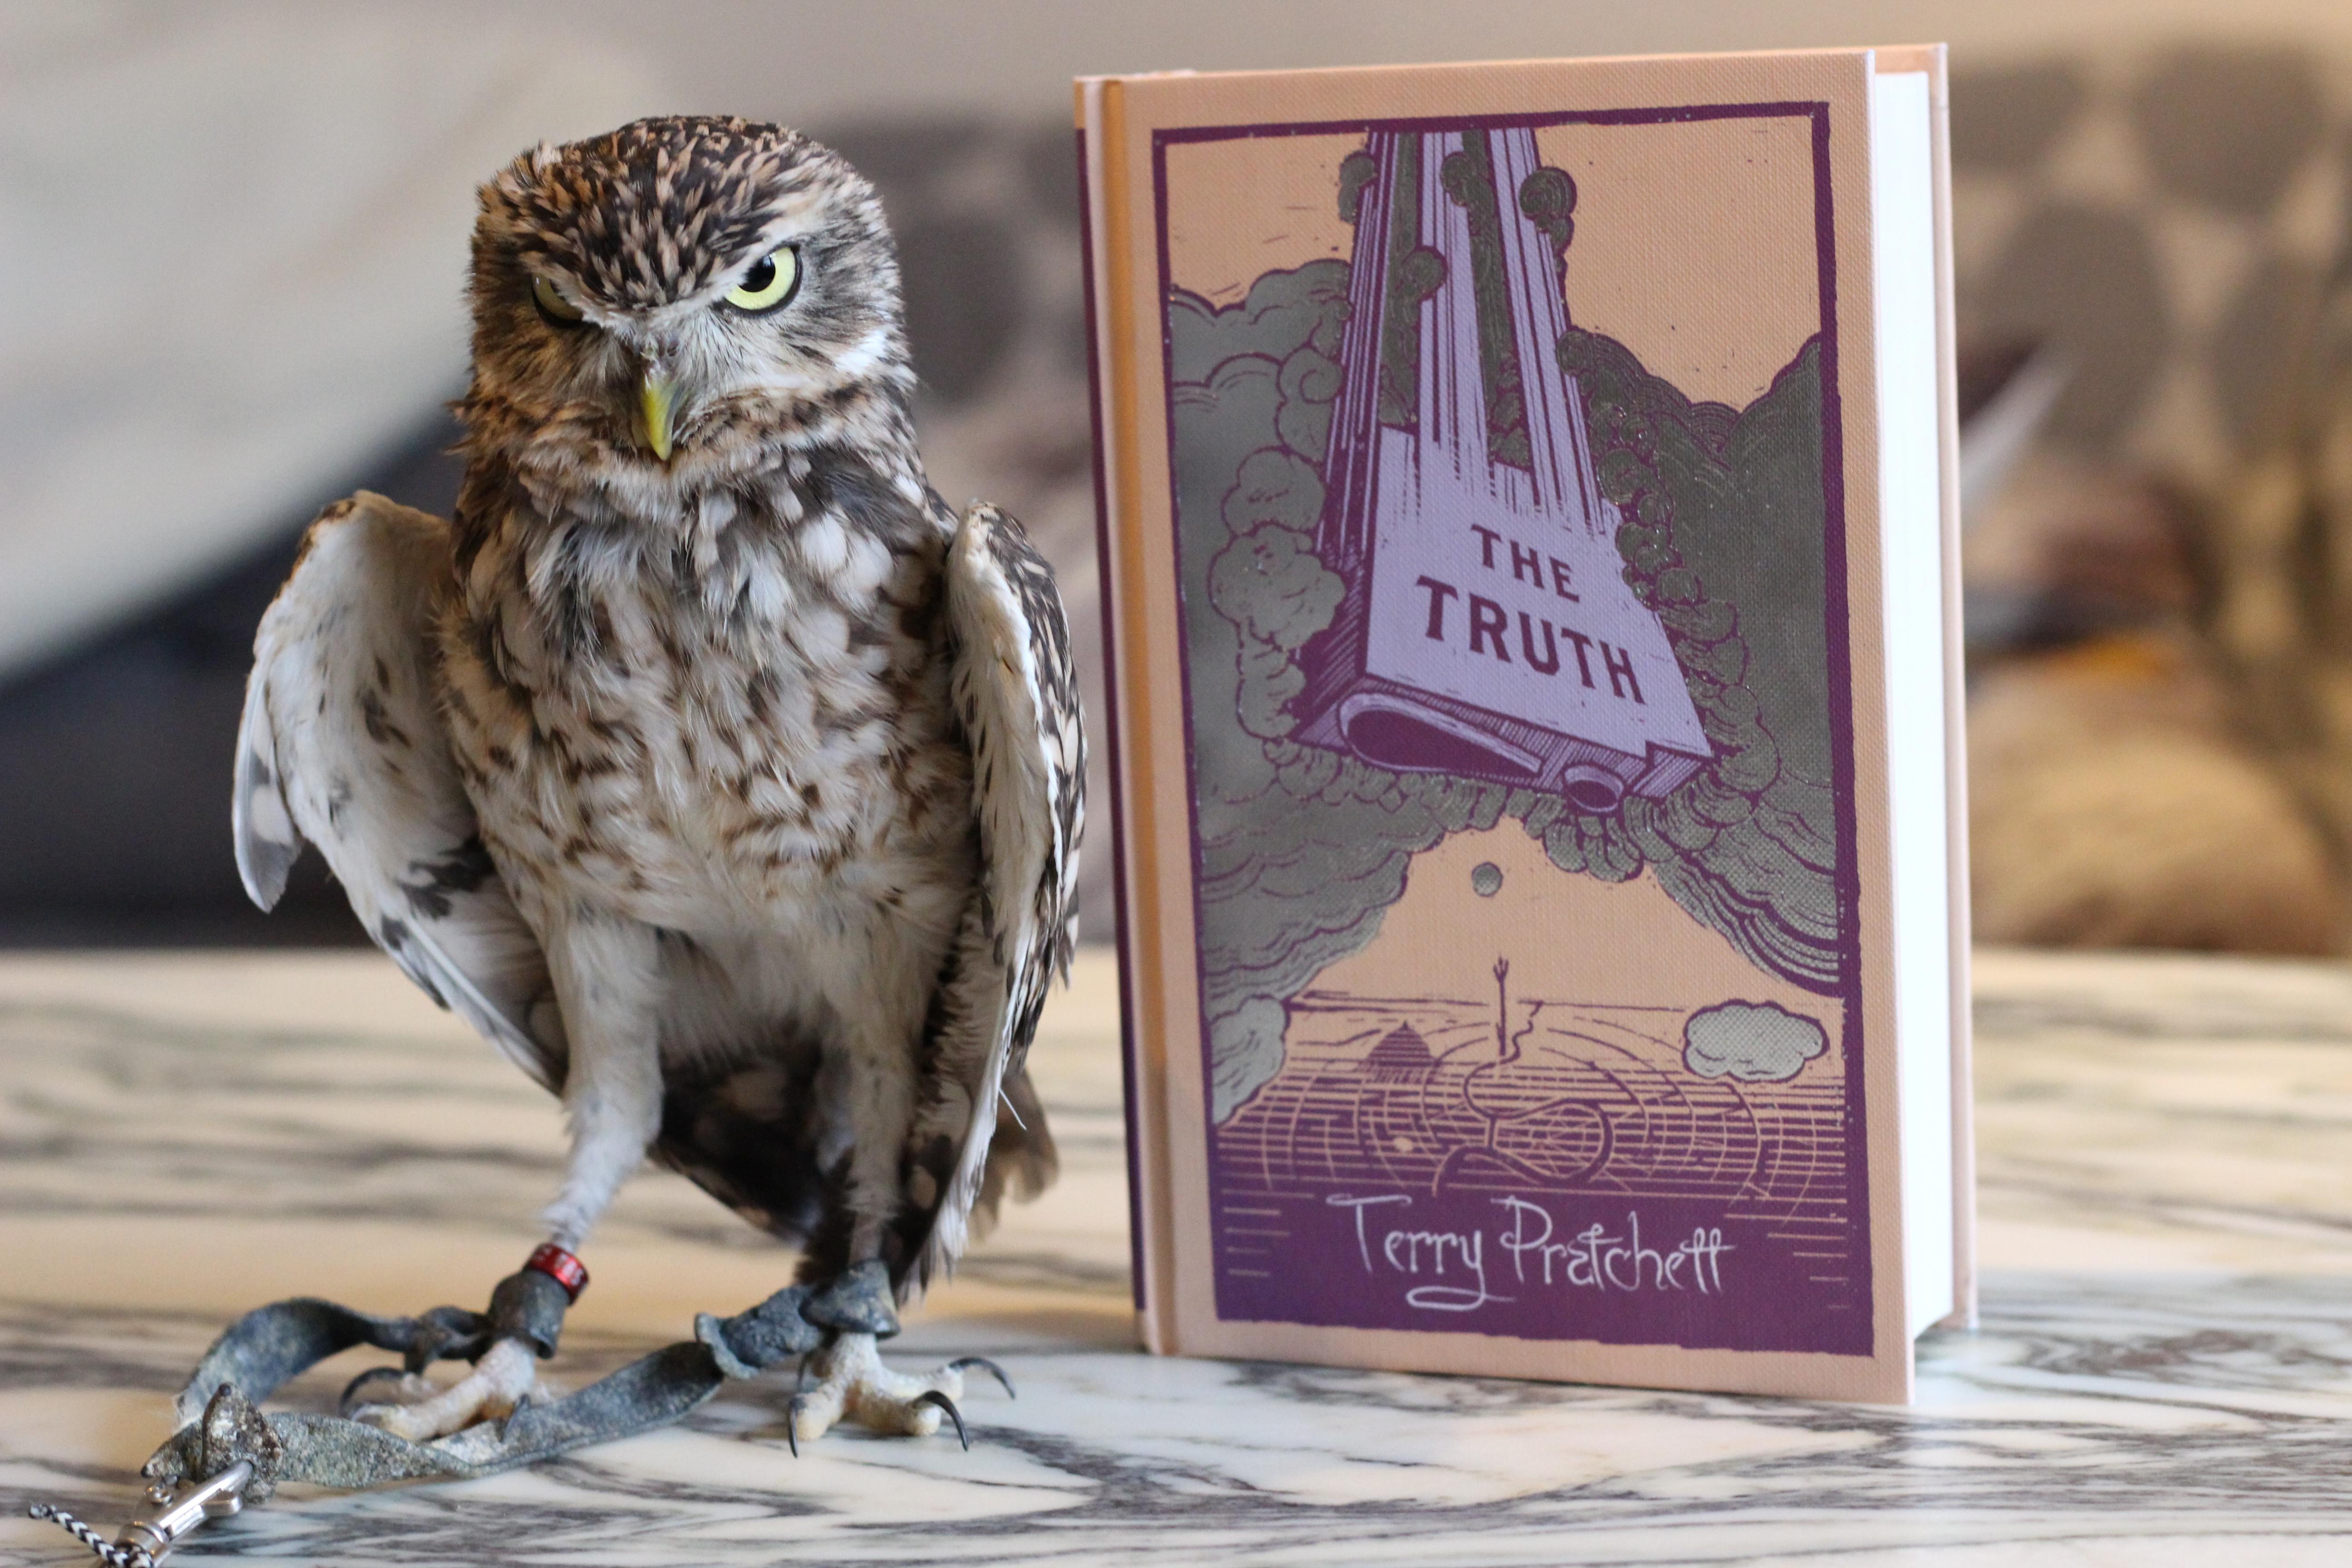 The Truth Terry Pratchett Owl